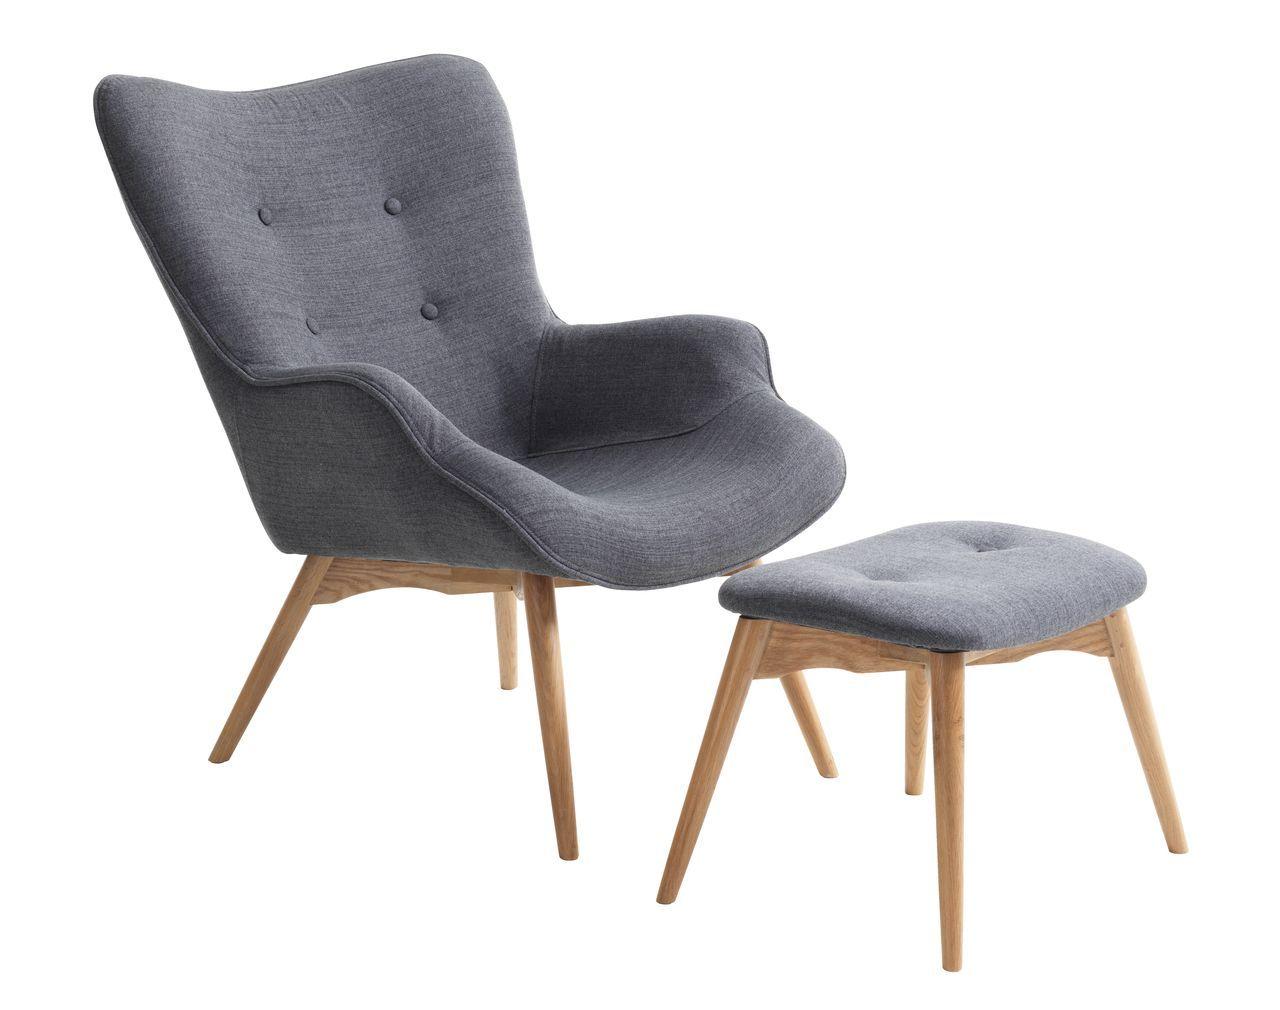 Armchair W Footstool Petersborg D Grey Jysk Armchair Wicker Armchair Chair